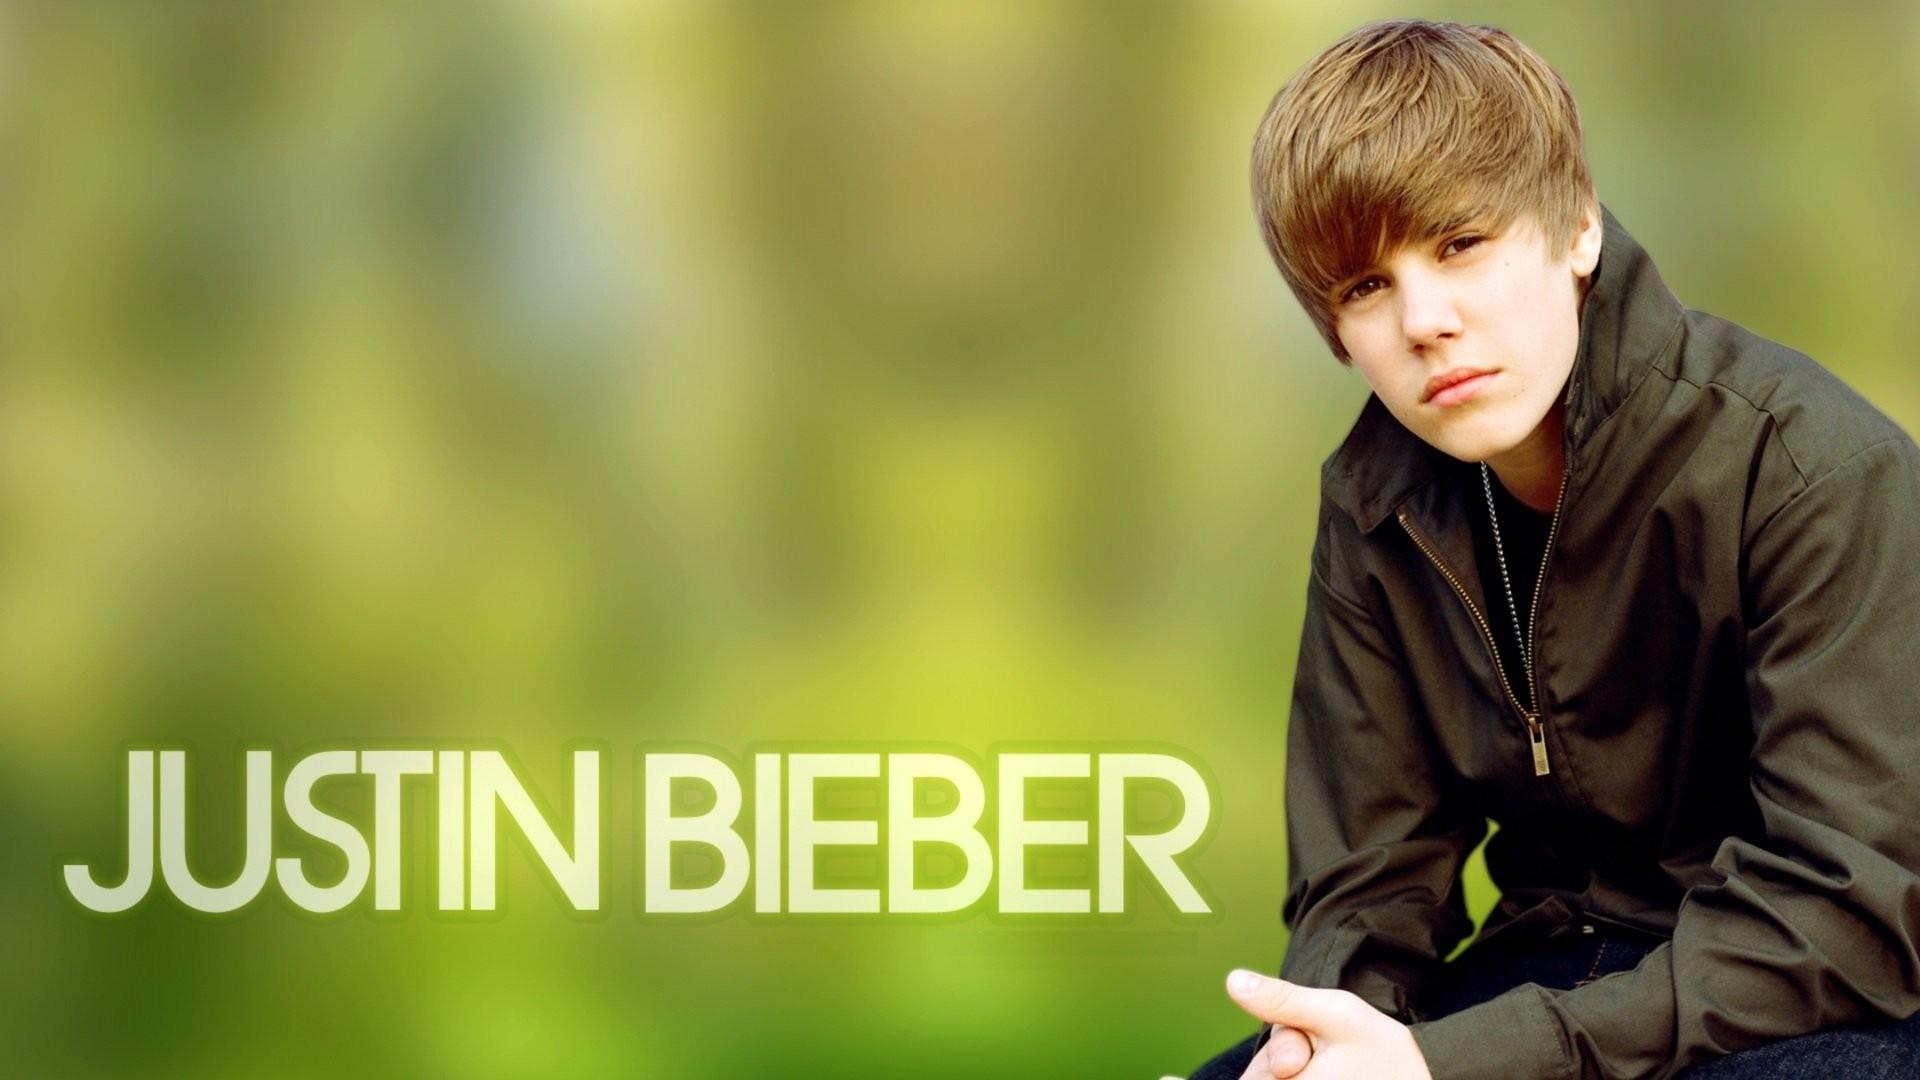 nice jb at singing – Justin Bieber Wallpaper